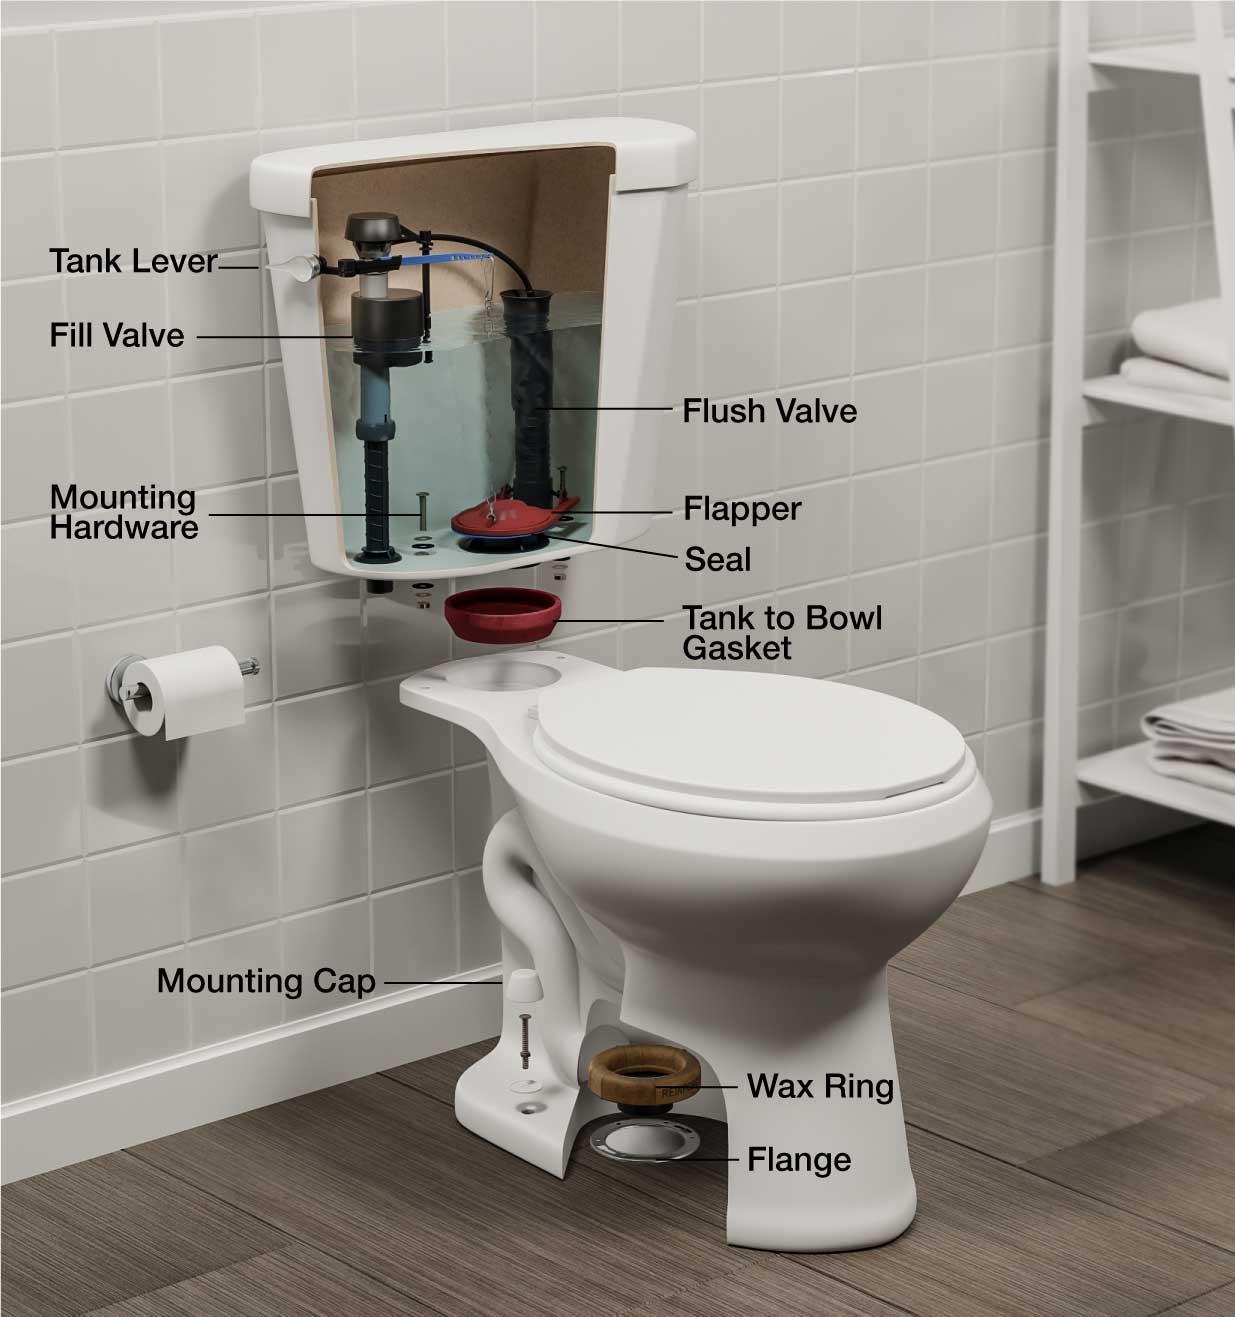 Toilet Bathroom Fittings Names   Decoromah